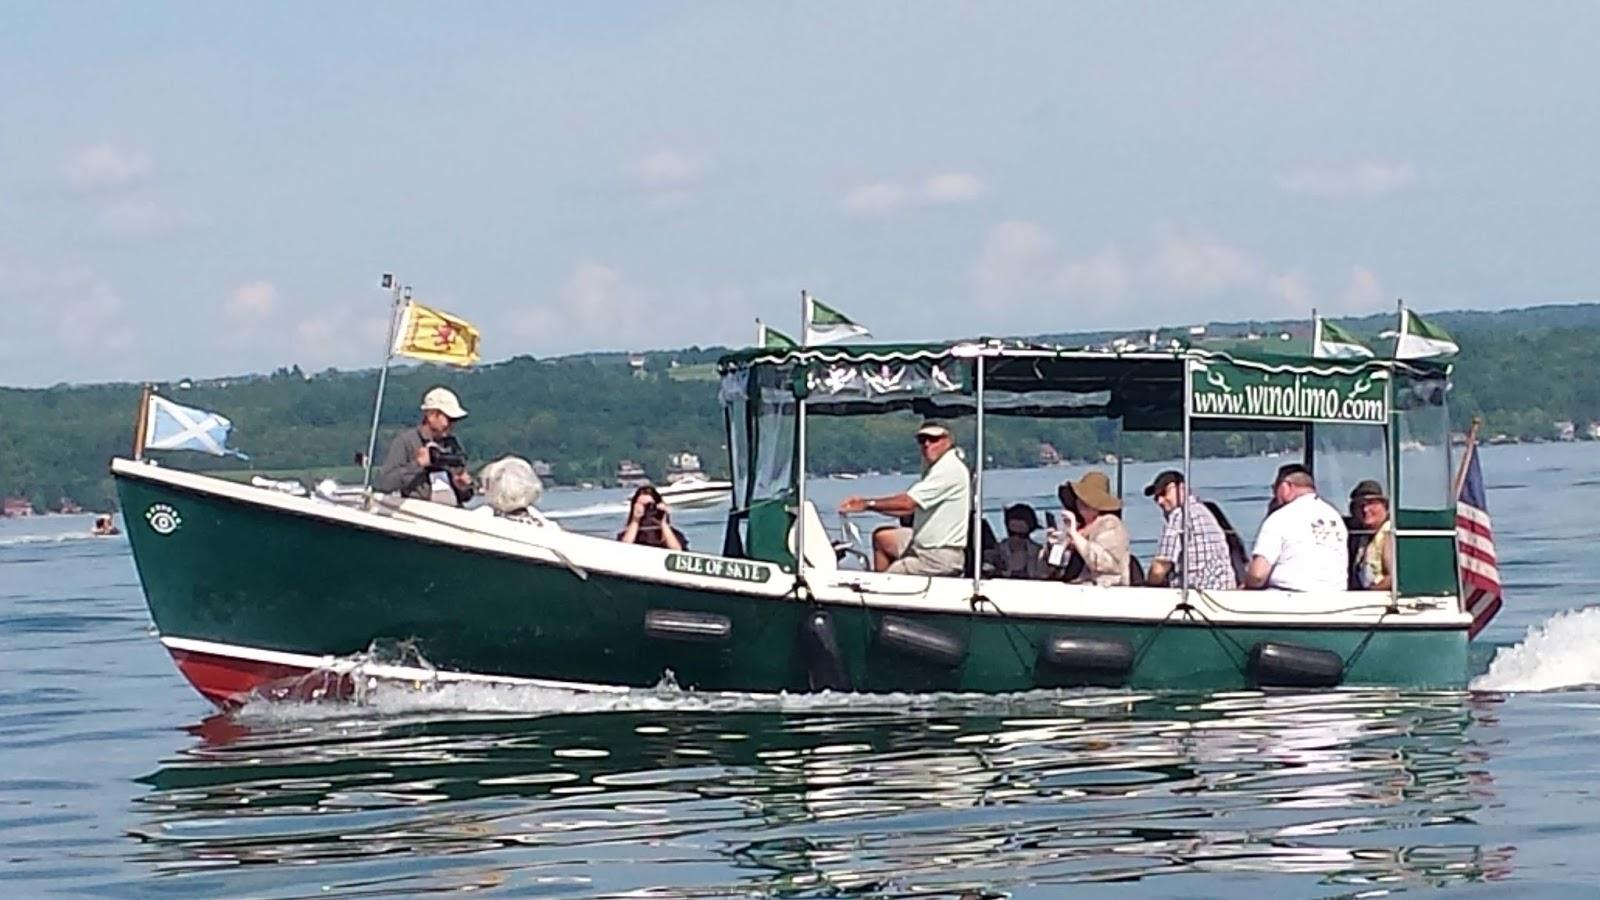 Seneca Lake Wine Tours By Boat